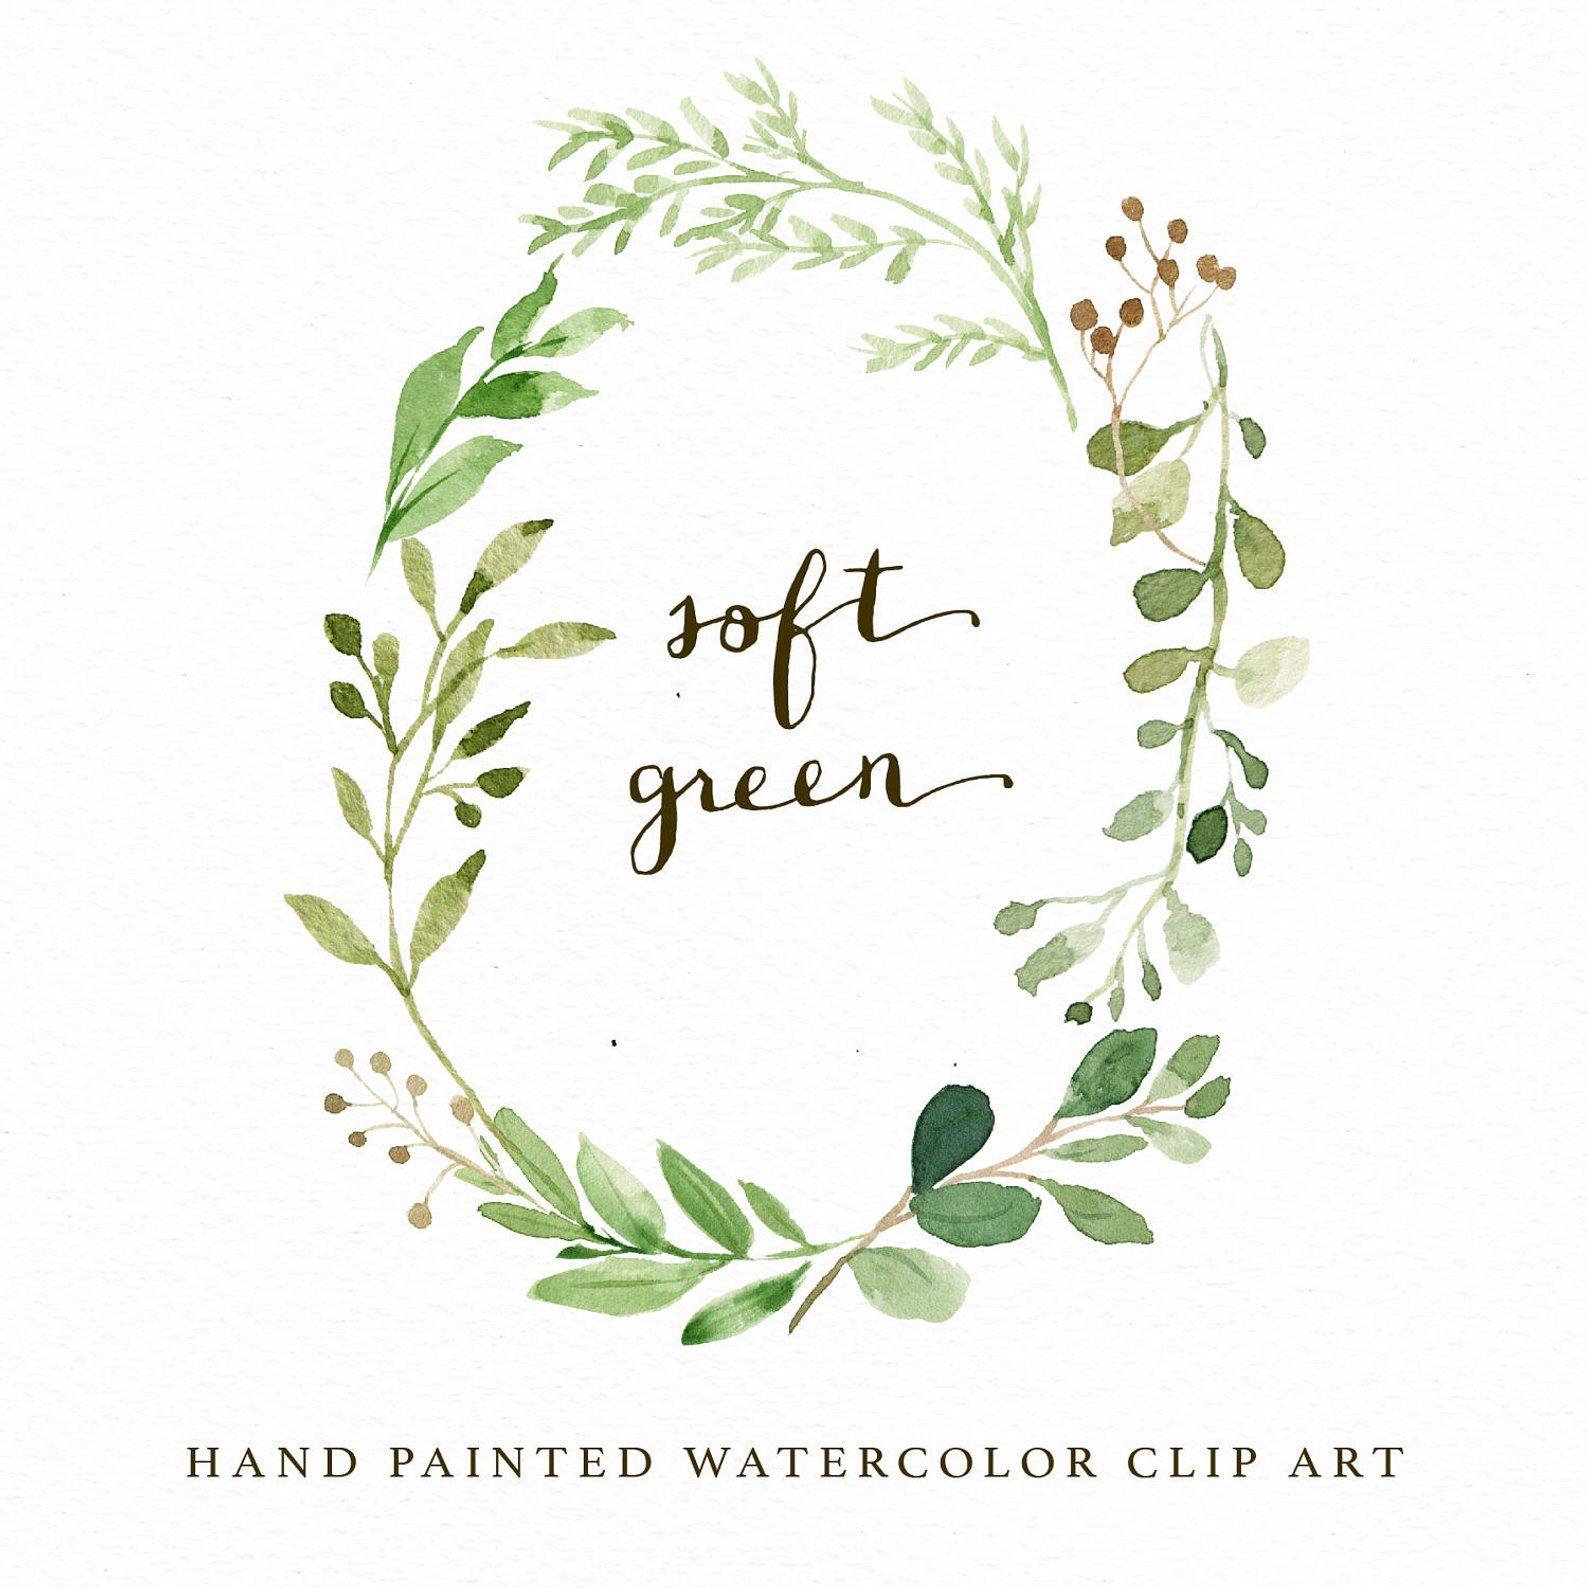 Watercolor Oval Leaf Wreath Clip Art Soft Green Small Etsy Wreath Clip Art Watercolor Flower Wreath Wreath Watercolor